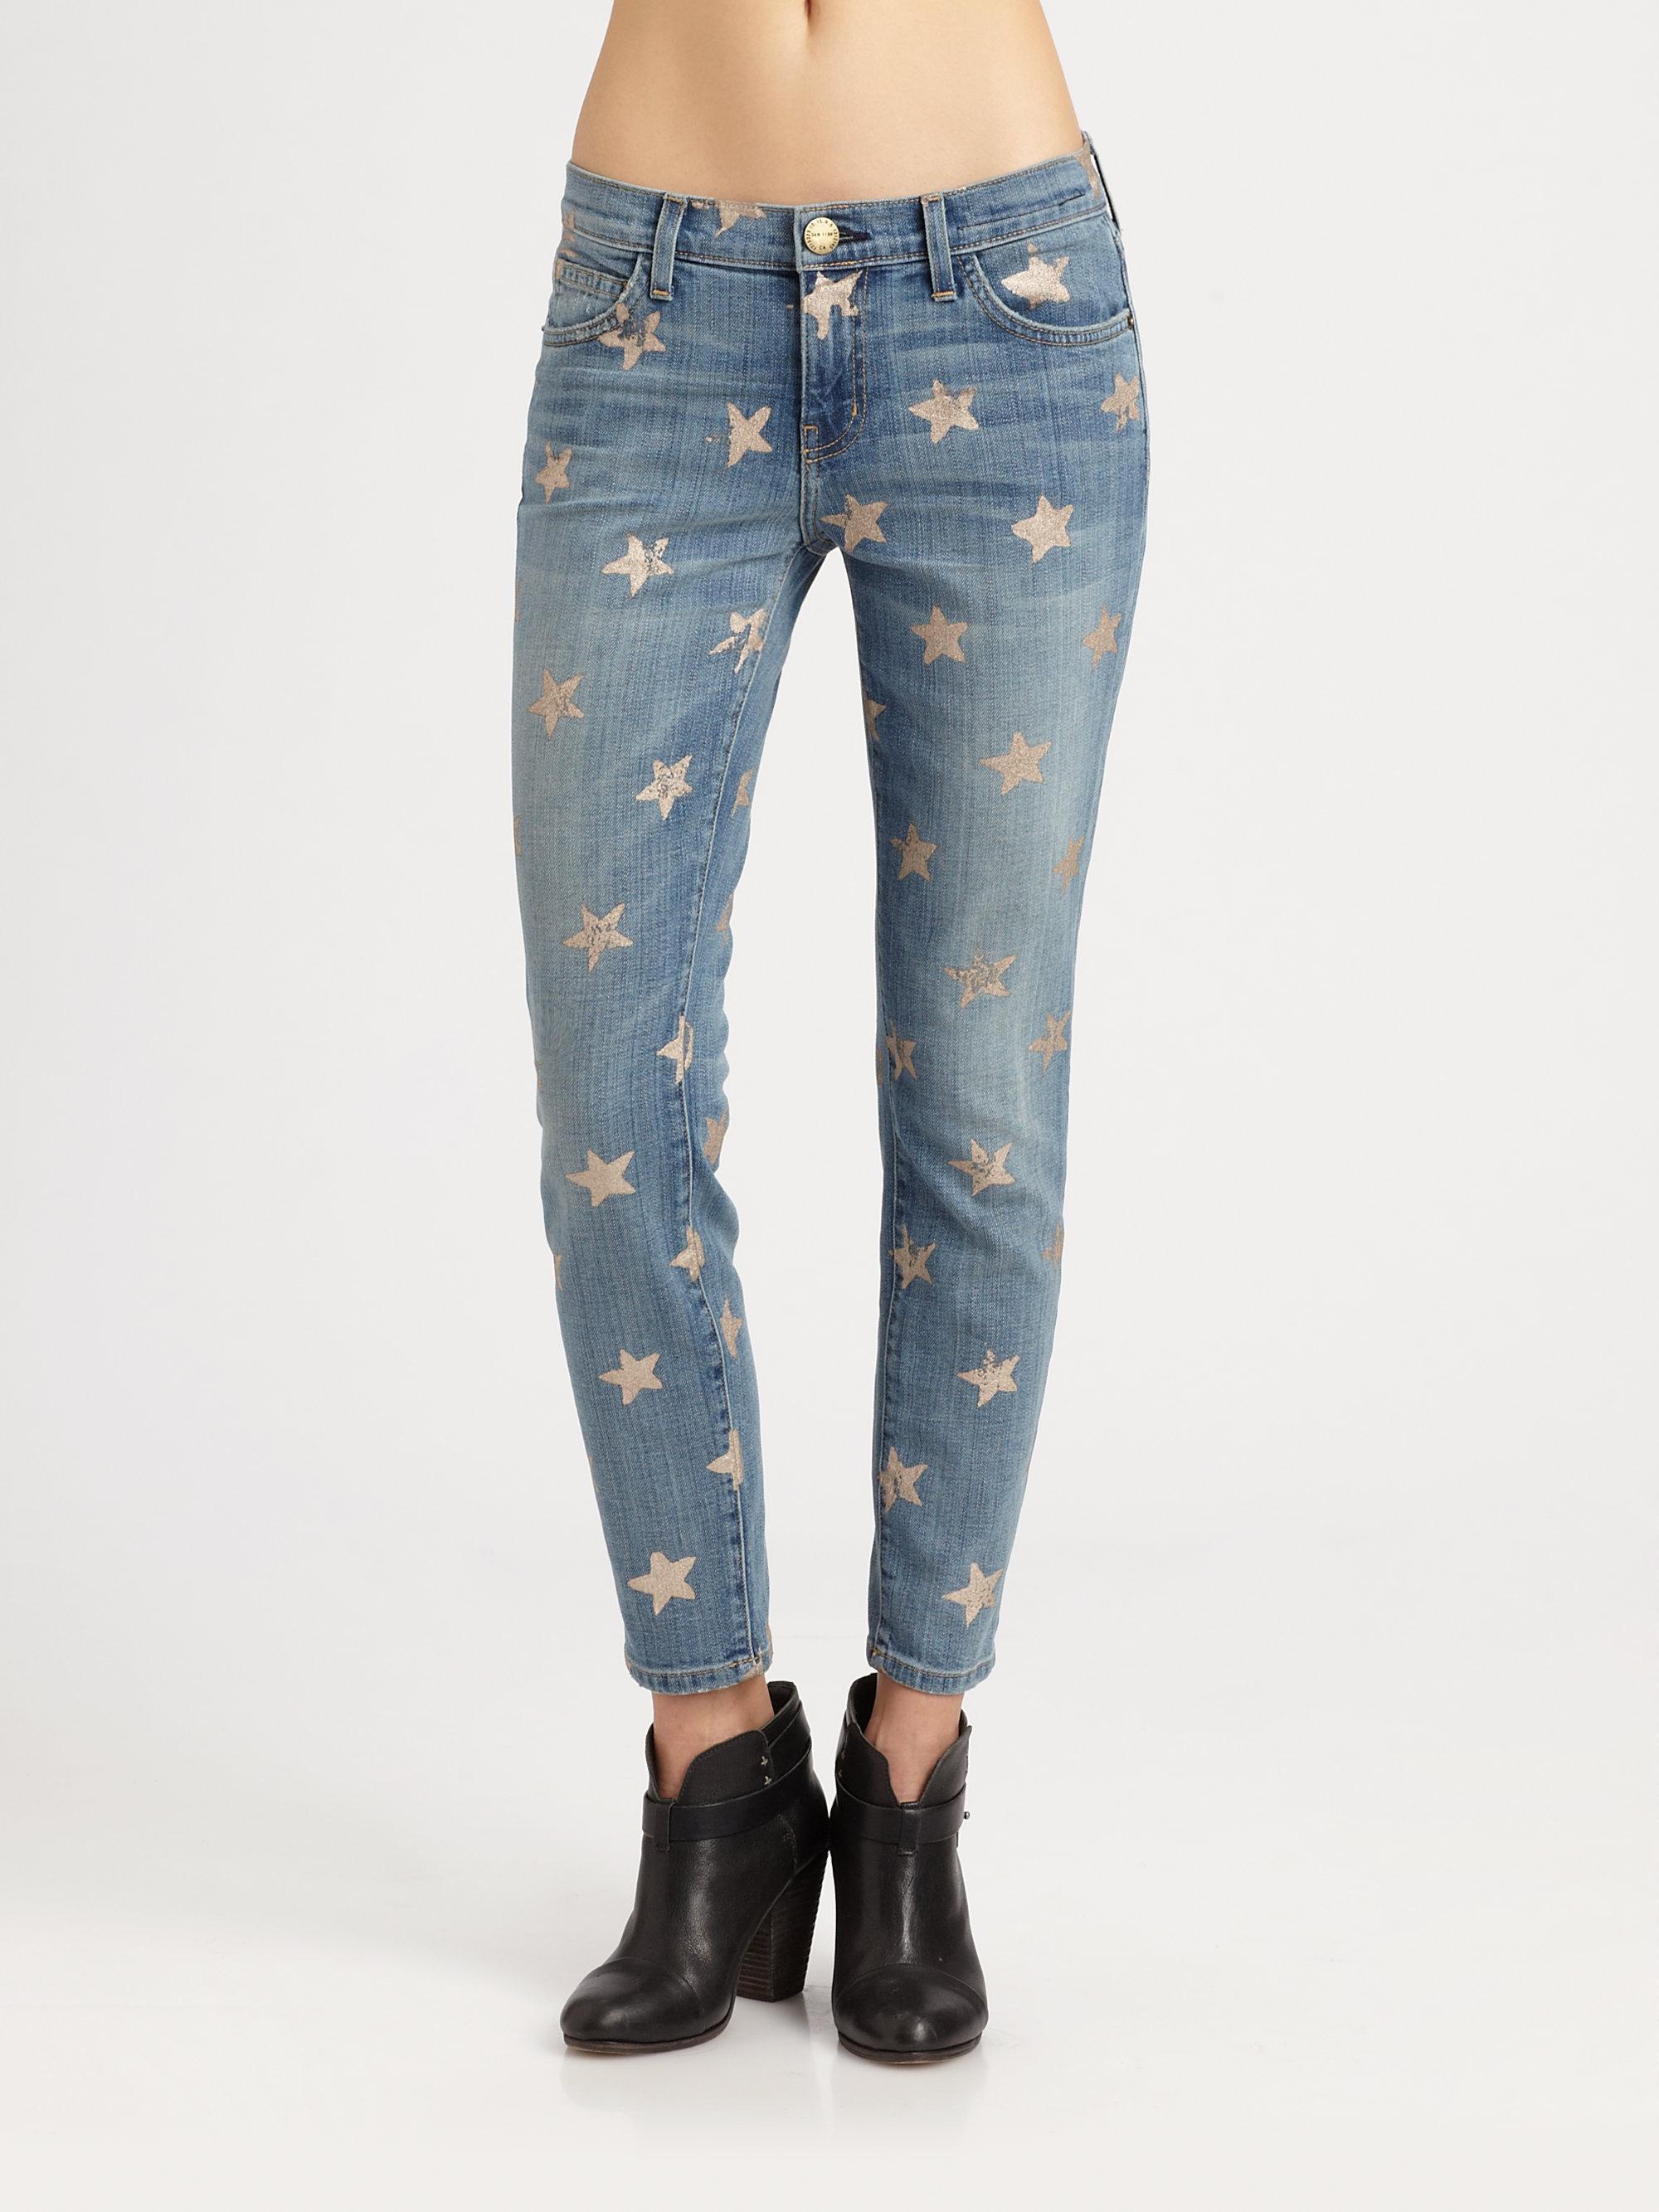 Lyst Current Elliott The Stiletto Starprint Jeans In Blue